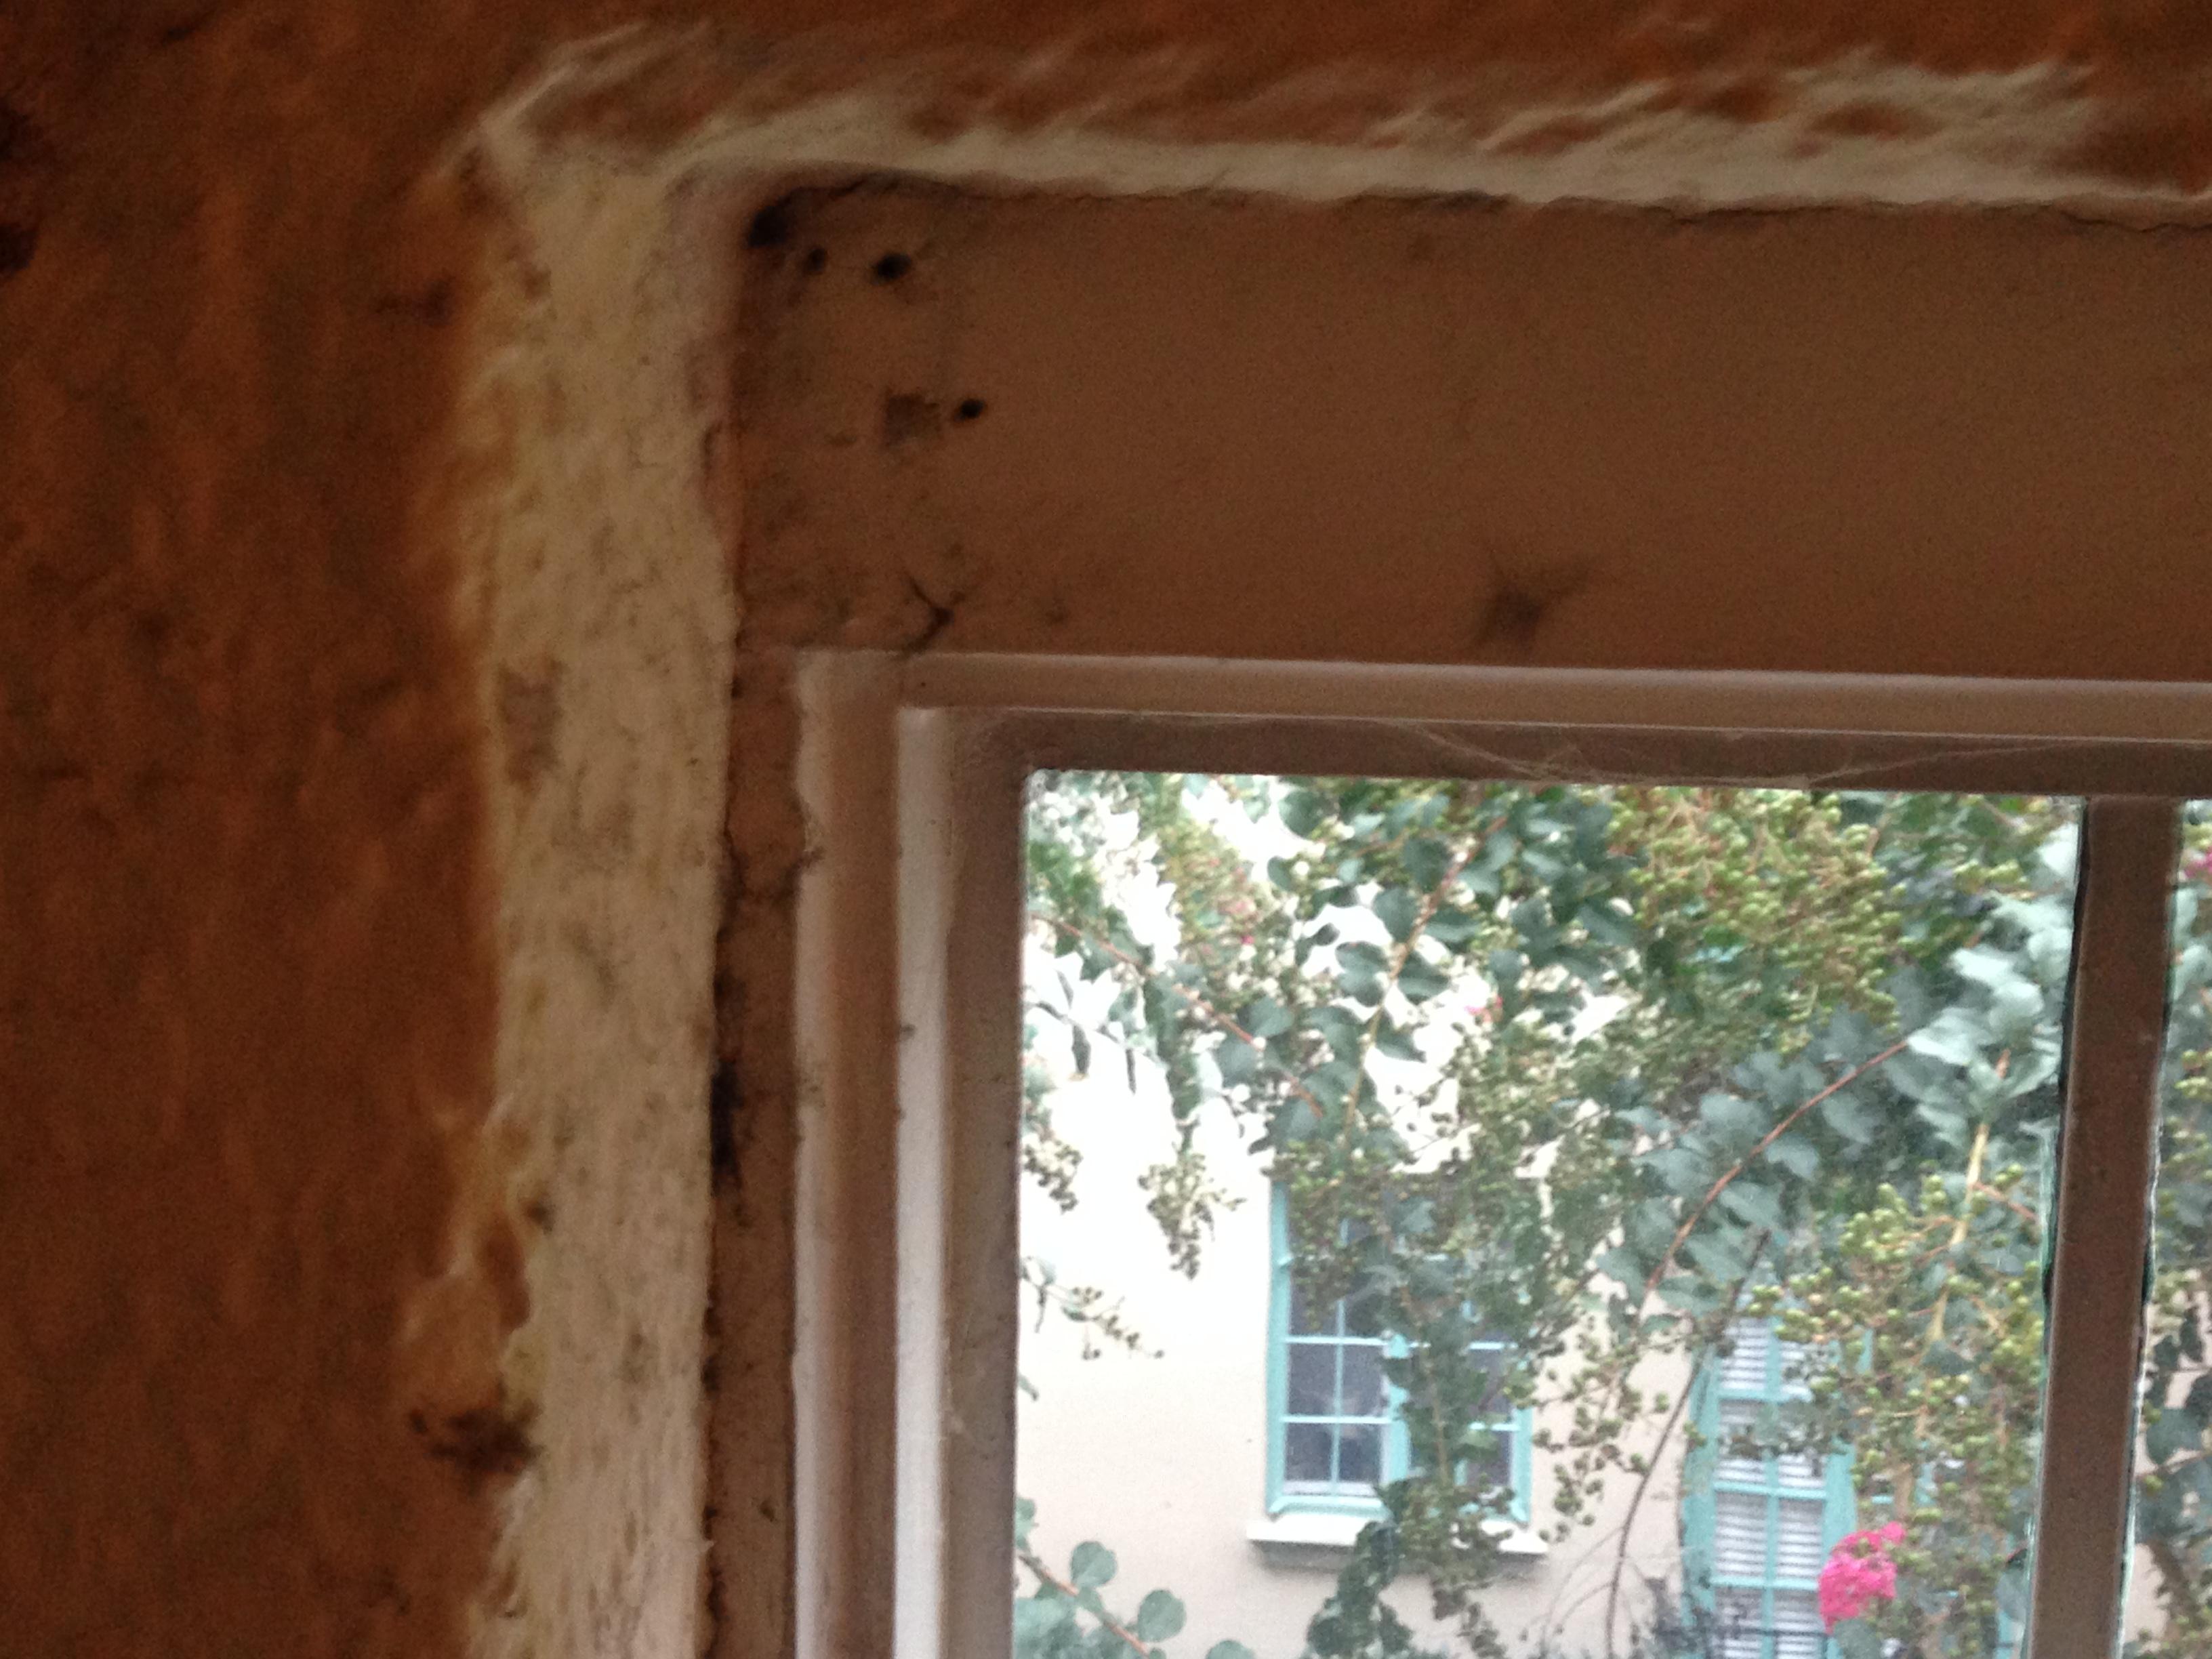 Uncategorized window sill decorations - Window Sills Window Sill Corner